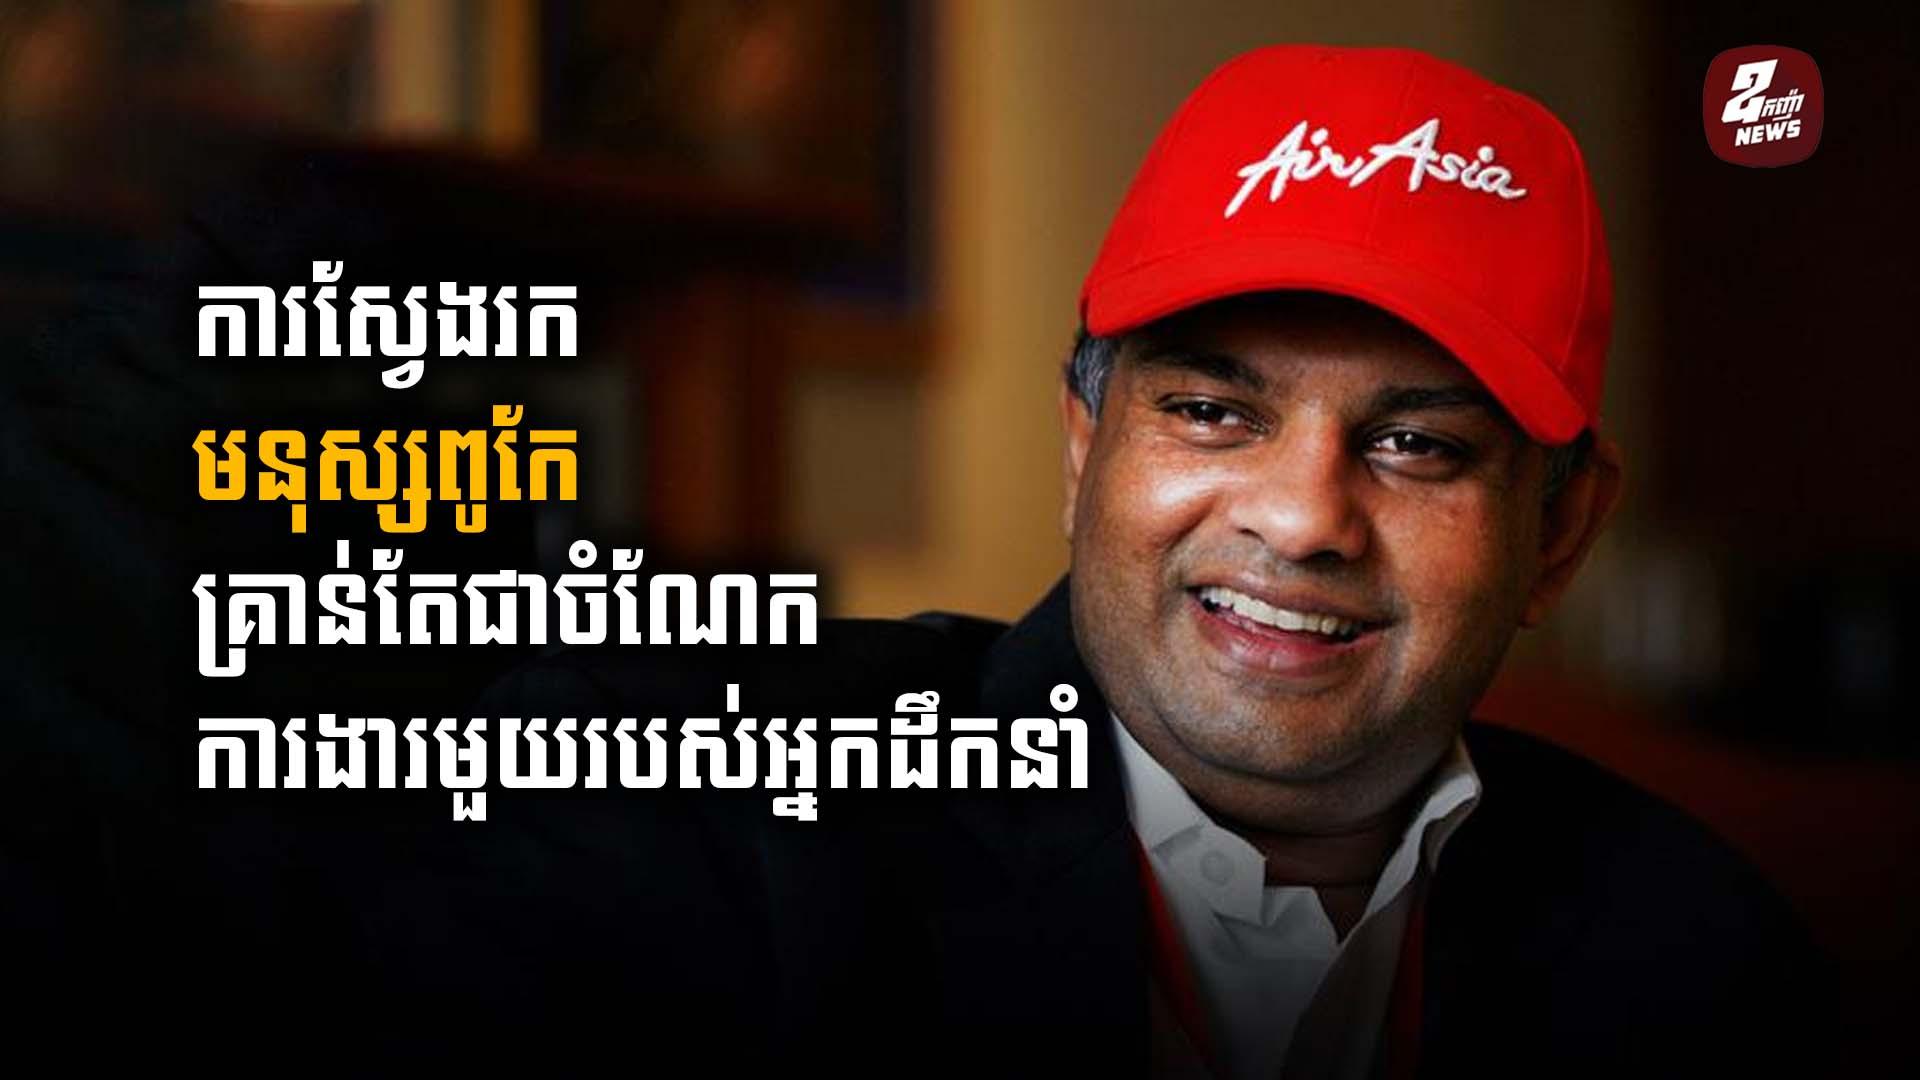 CEO AirAsia៖ក្រុមហ៊ុនជាច្រើនមិនដឹងពីតម្លៃពិតប្រាកដនៃបុគ្គលិក តែ AirAsia យល់ច្បាស់ពីរឿងនេះ